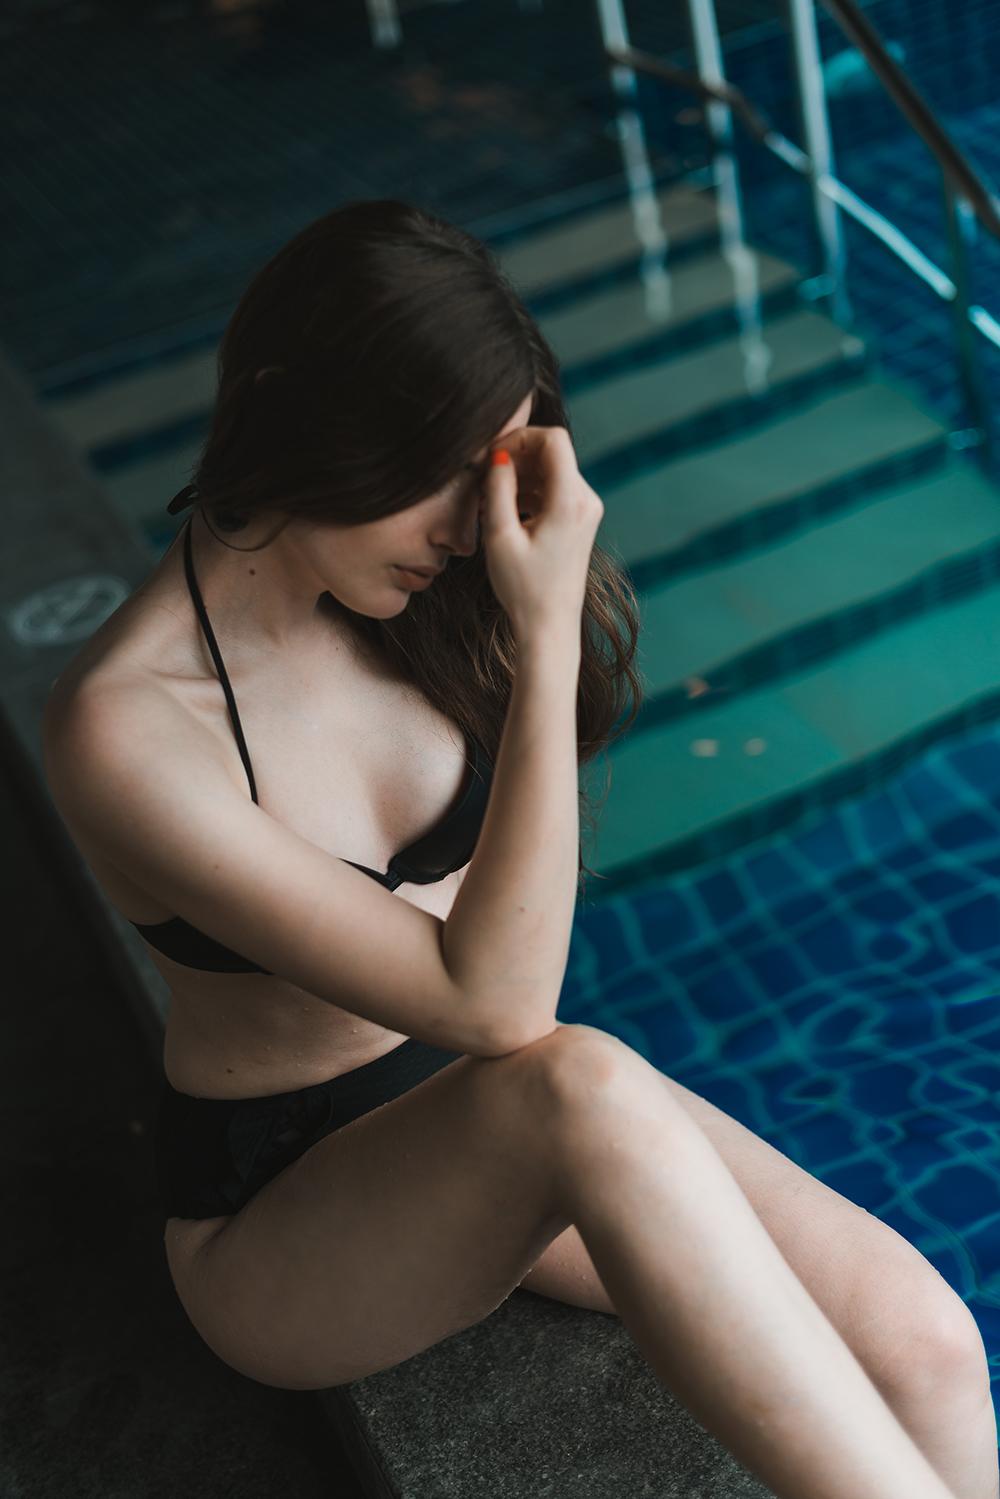 Selbstbewusst durch Kleidung-Freitagspost-Berlinblog-Bikini-andysparkles